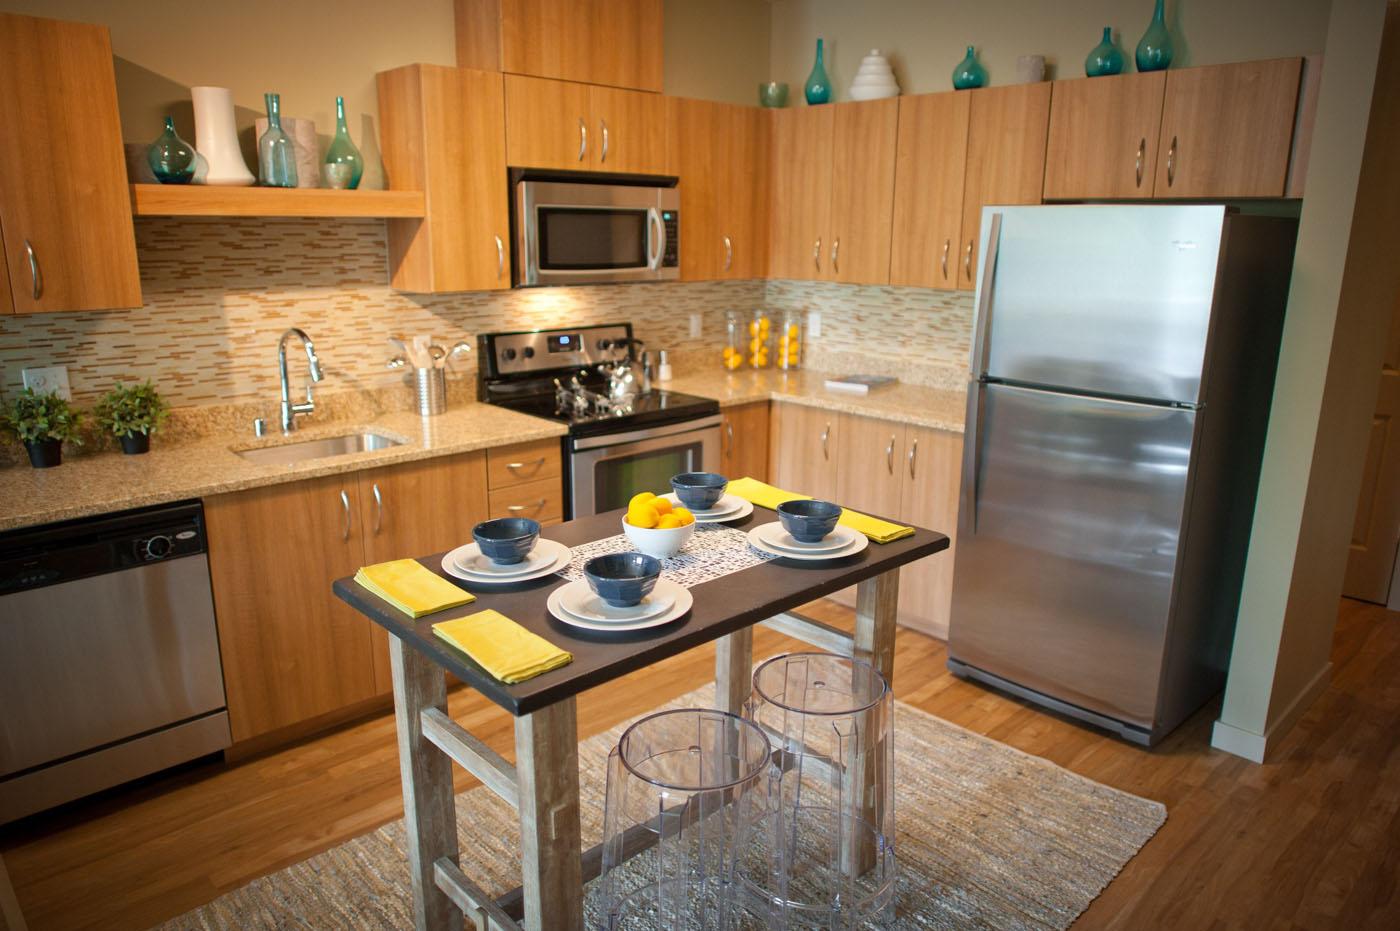 2012 May 29 - Jasper Apartments interiors, Wedgwood, Seattle. CREDIT: Richard Walker/Vecta Photo